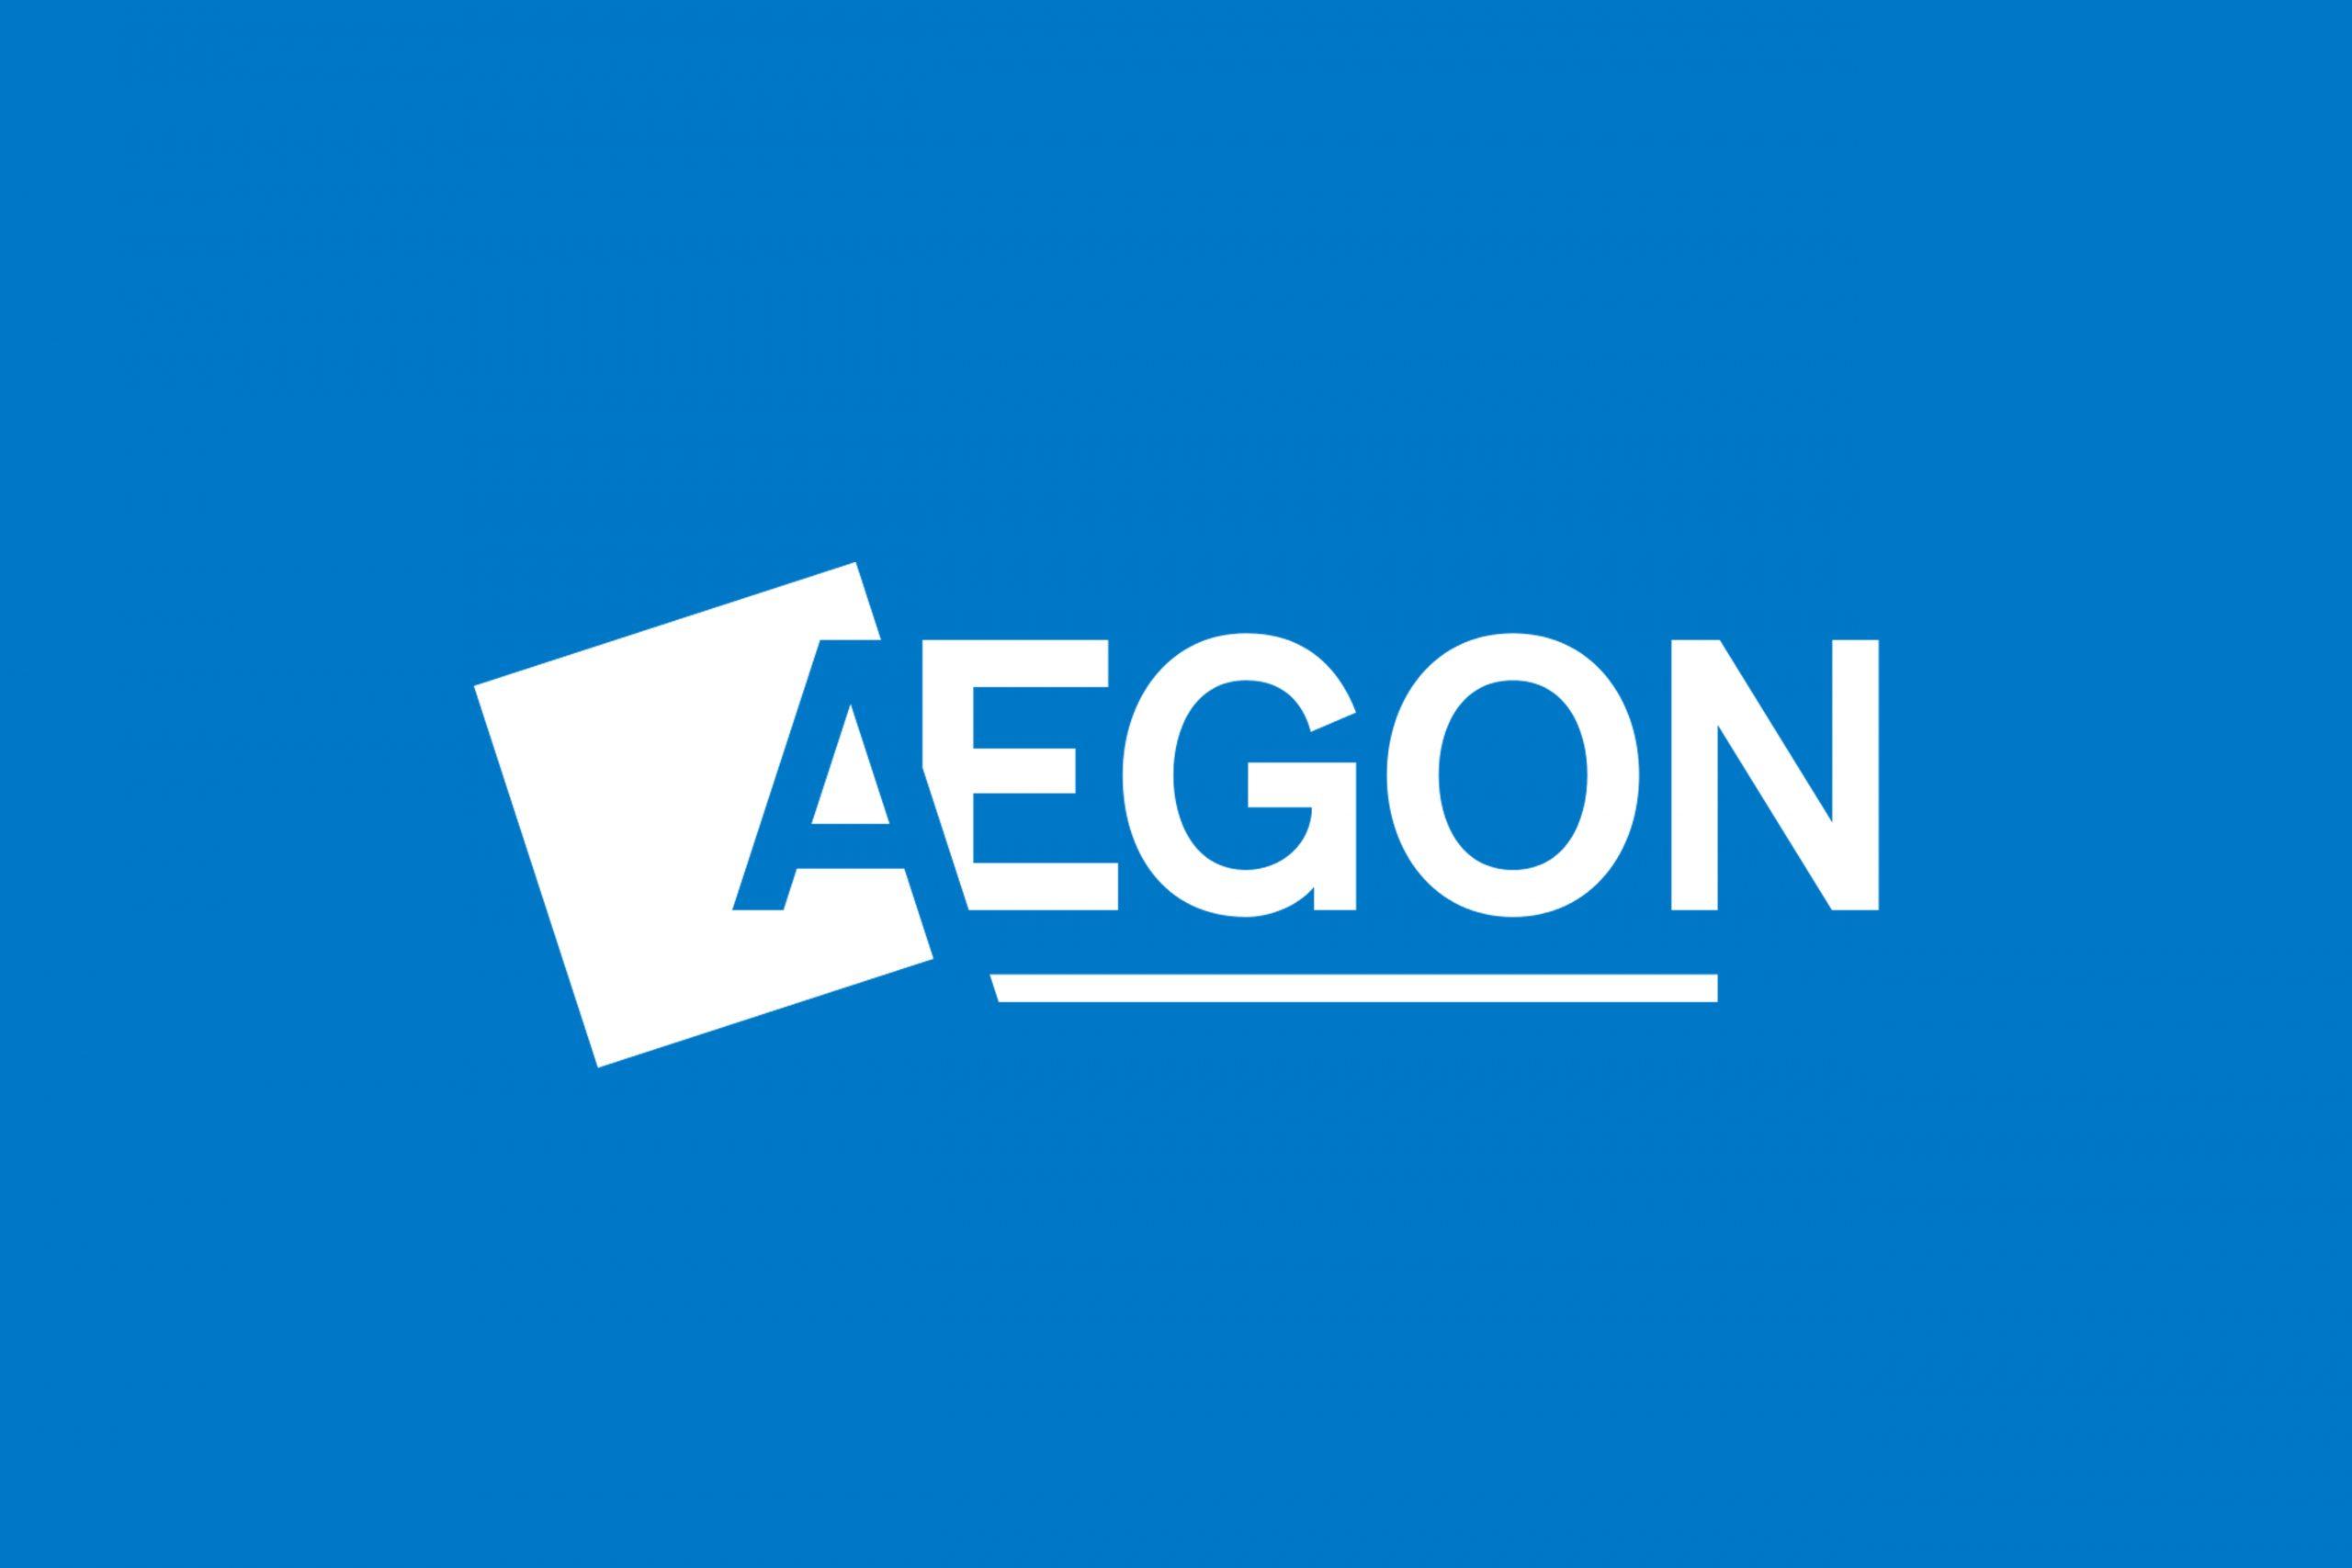 Aegon Thumbnail